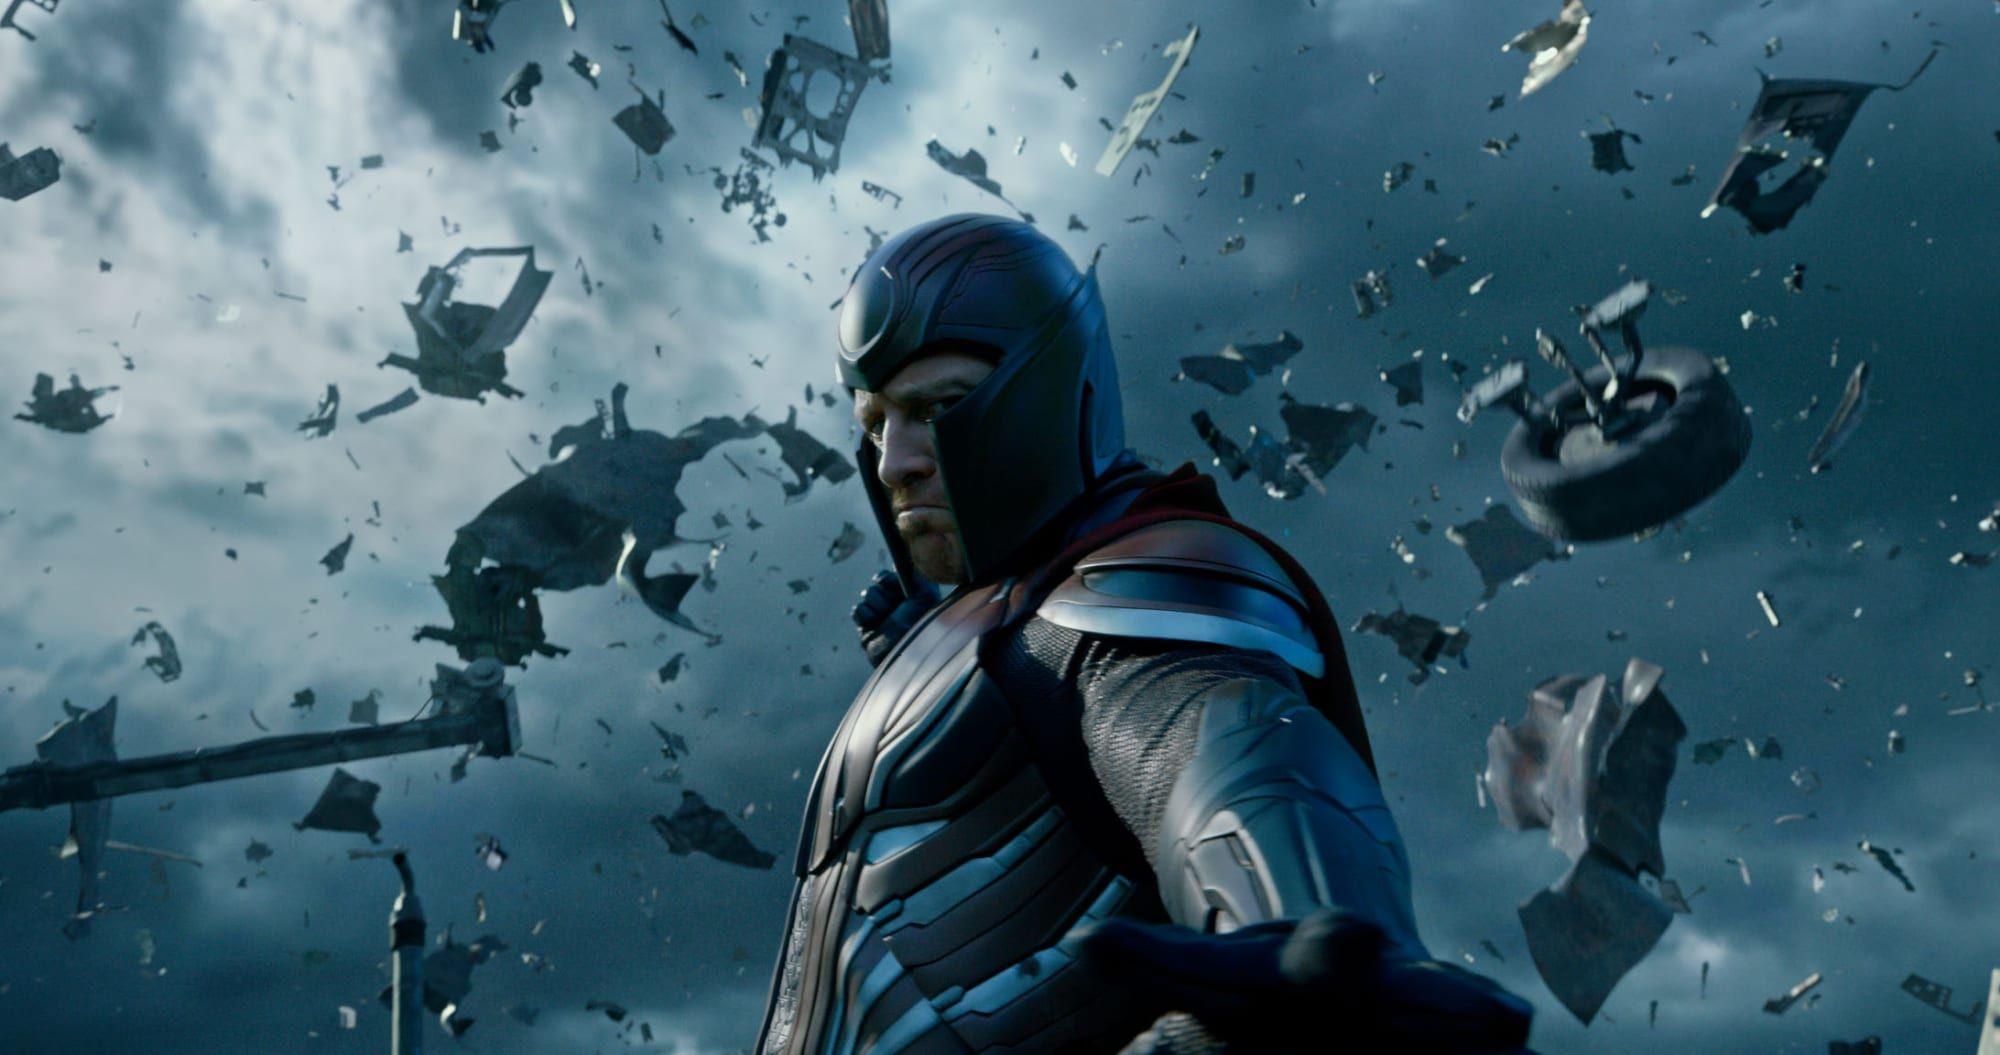 List Of X Men Movies Marvel Universe Marvelmoviesinorder List Of X Men Movies In 2020 Man Movies Marvel Movies In Order X Men